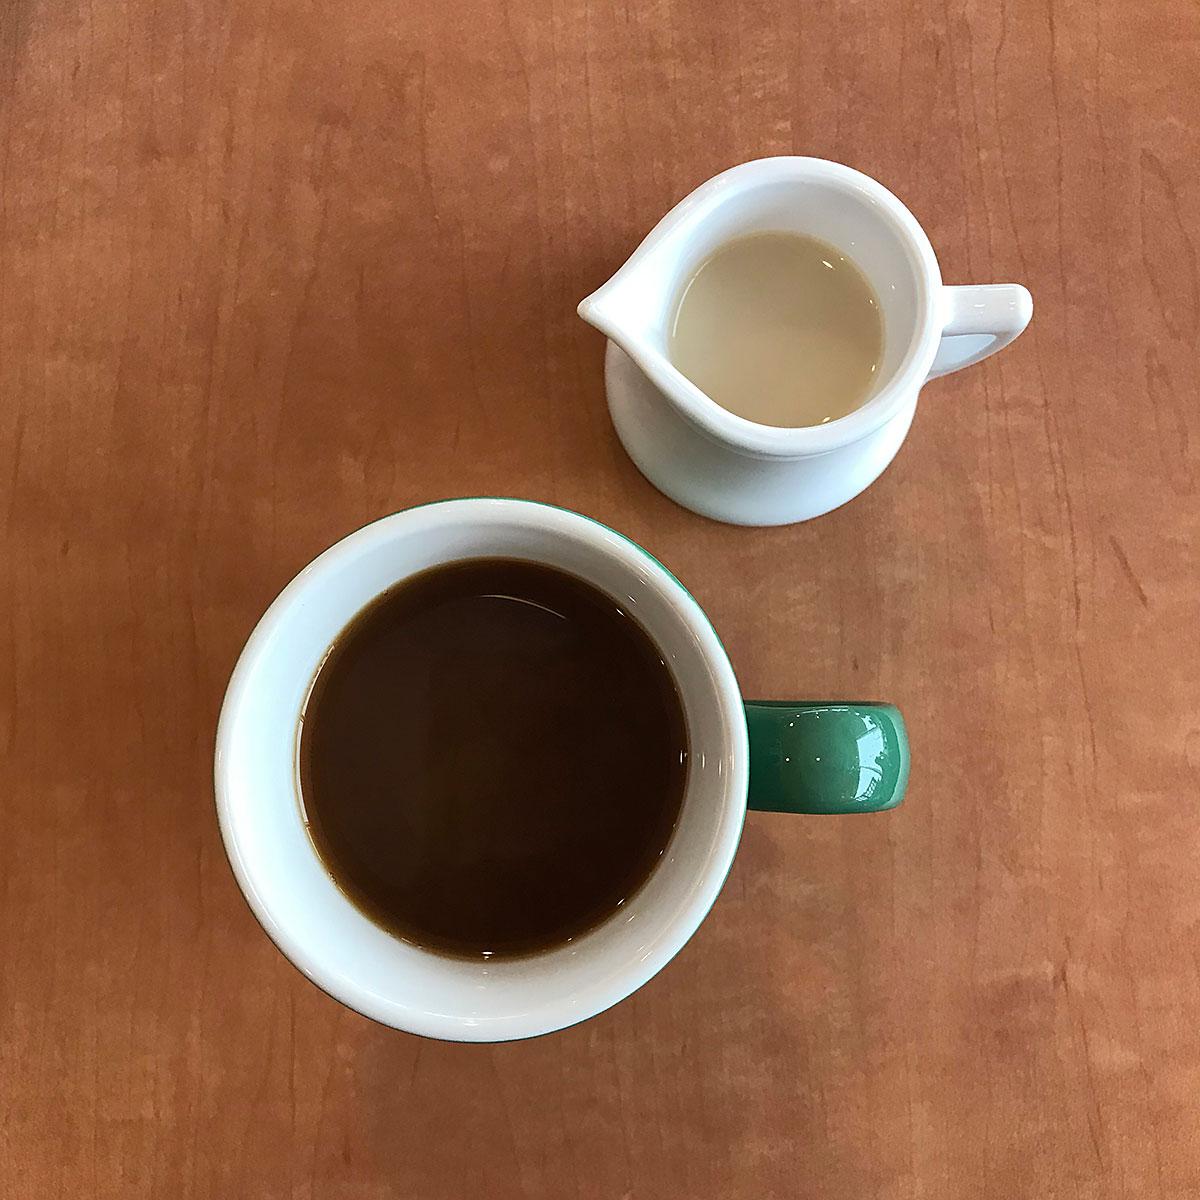 Tiny Trash Can soy milk coffee creamer